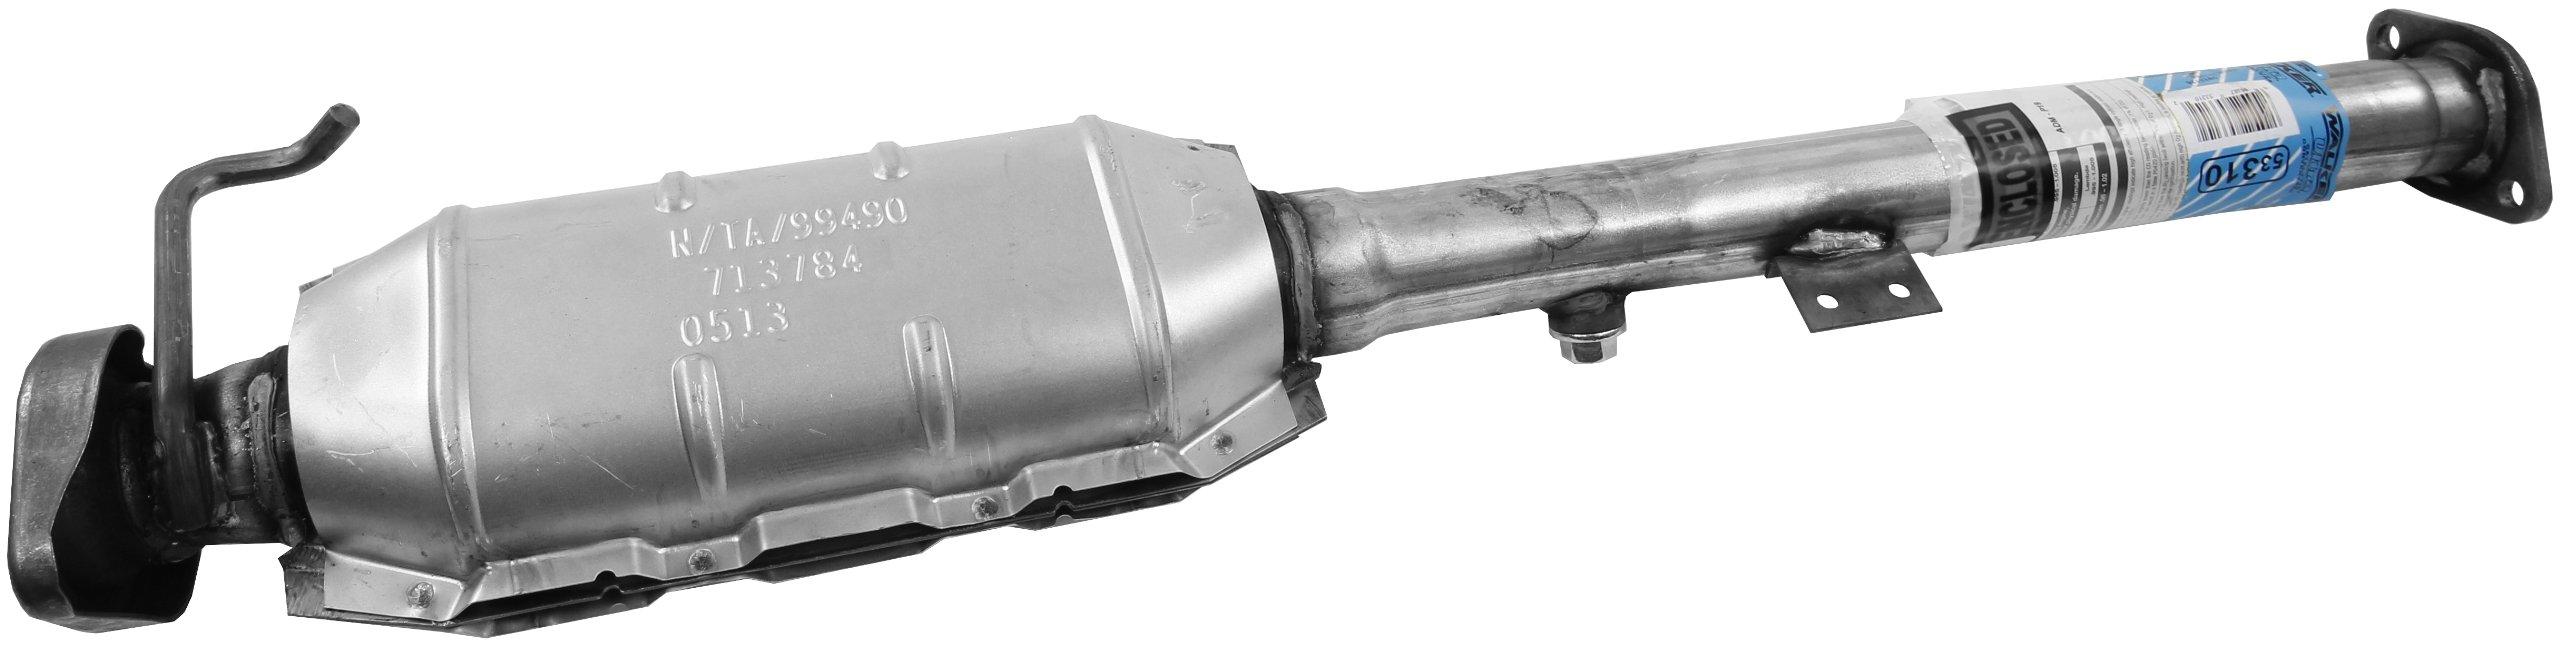 Walker 53310 Ultra EPA Certified Catalytic Converter